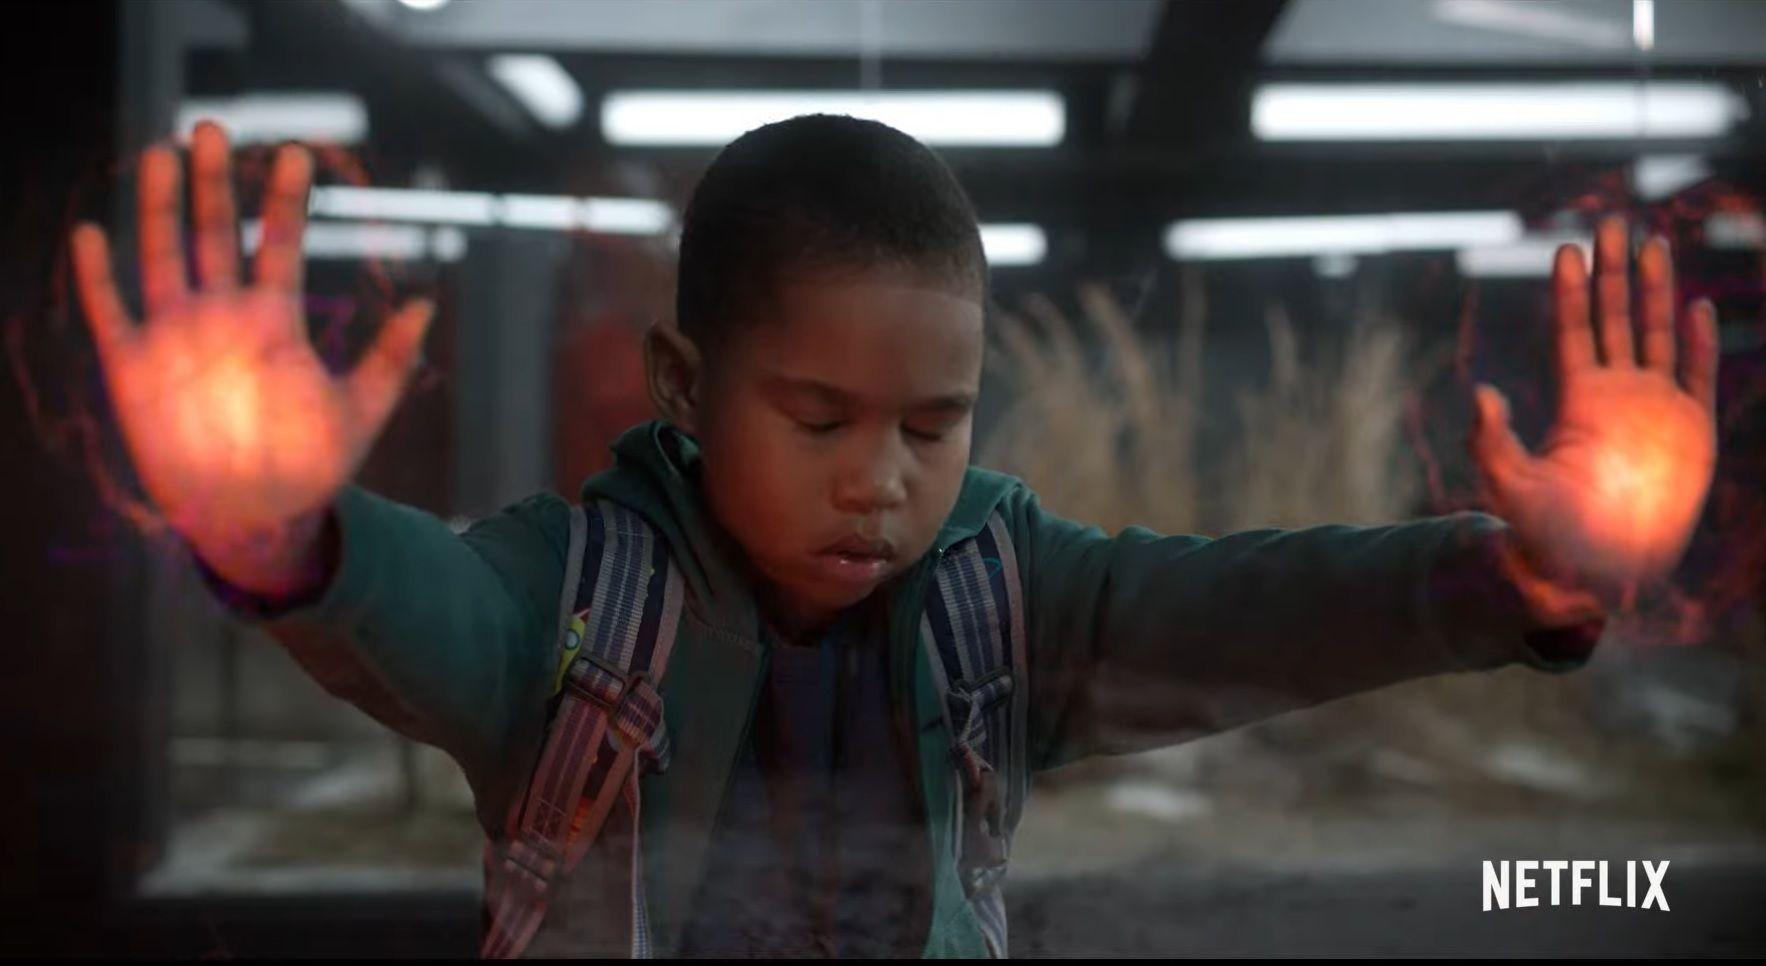 Revisión de Netflix: 'Raising Dion' es un programa familiar imprescindible 1